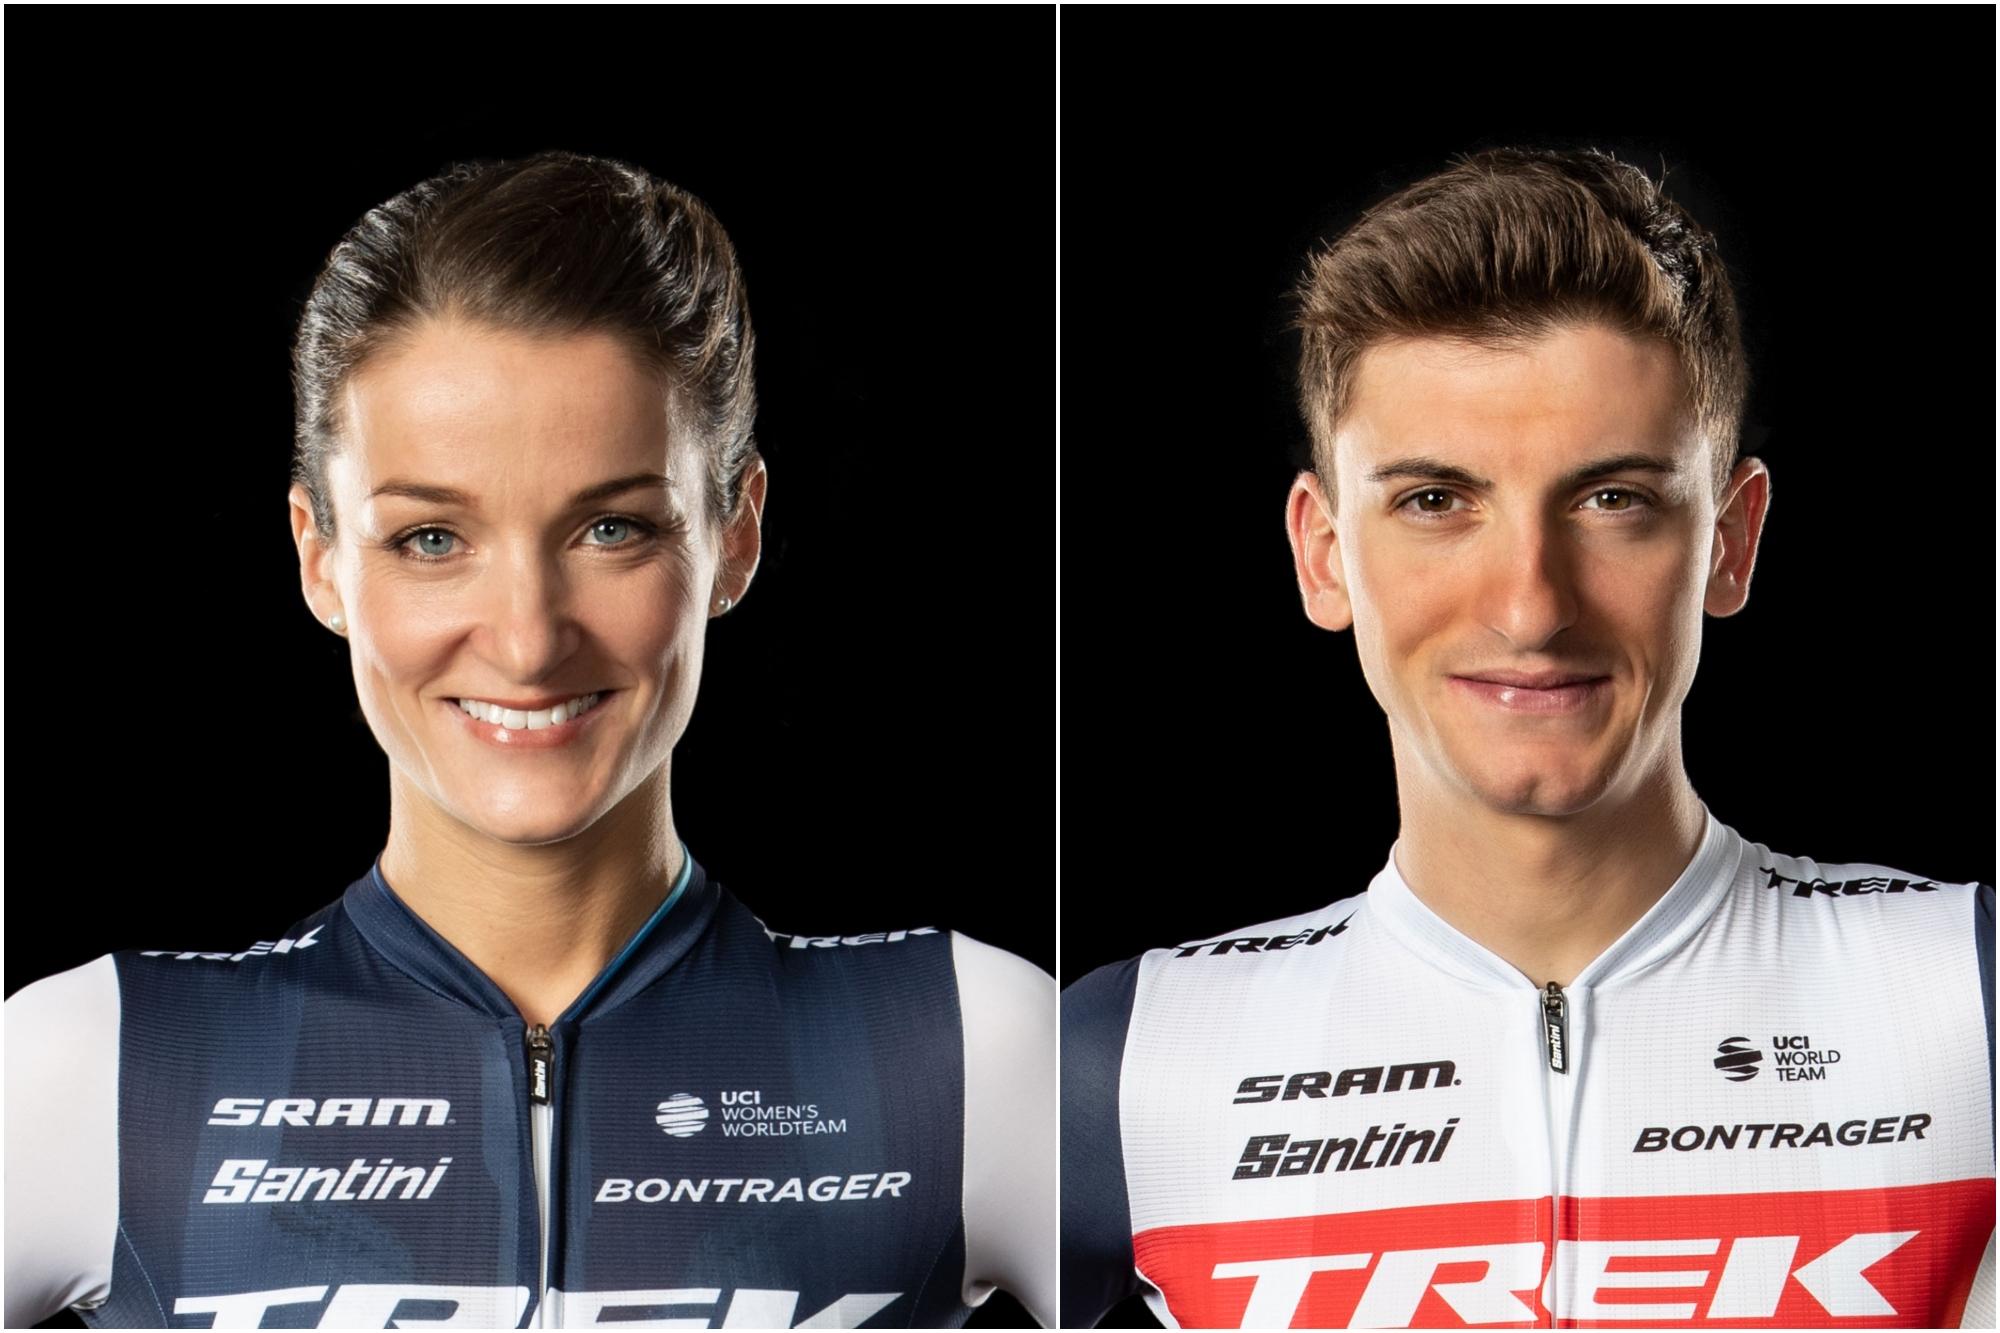 Men/'s 2018 Trek Segafredo Team Tour de France Classic Cycling Jersey in White